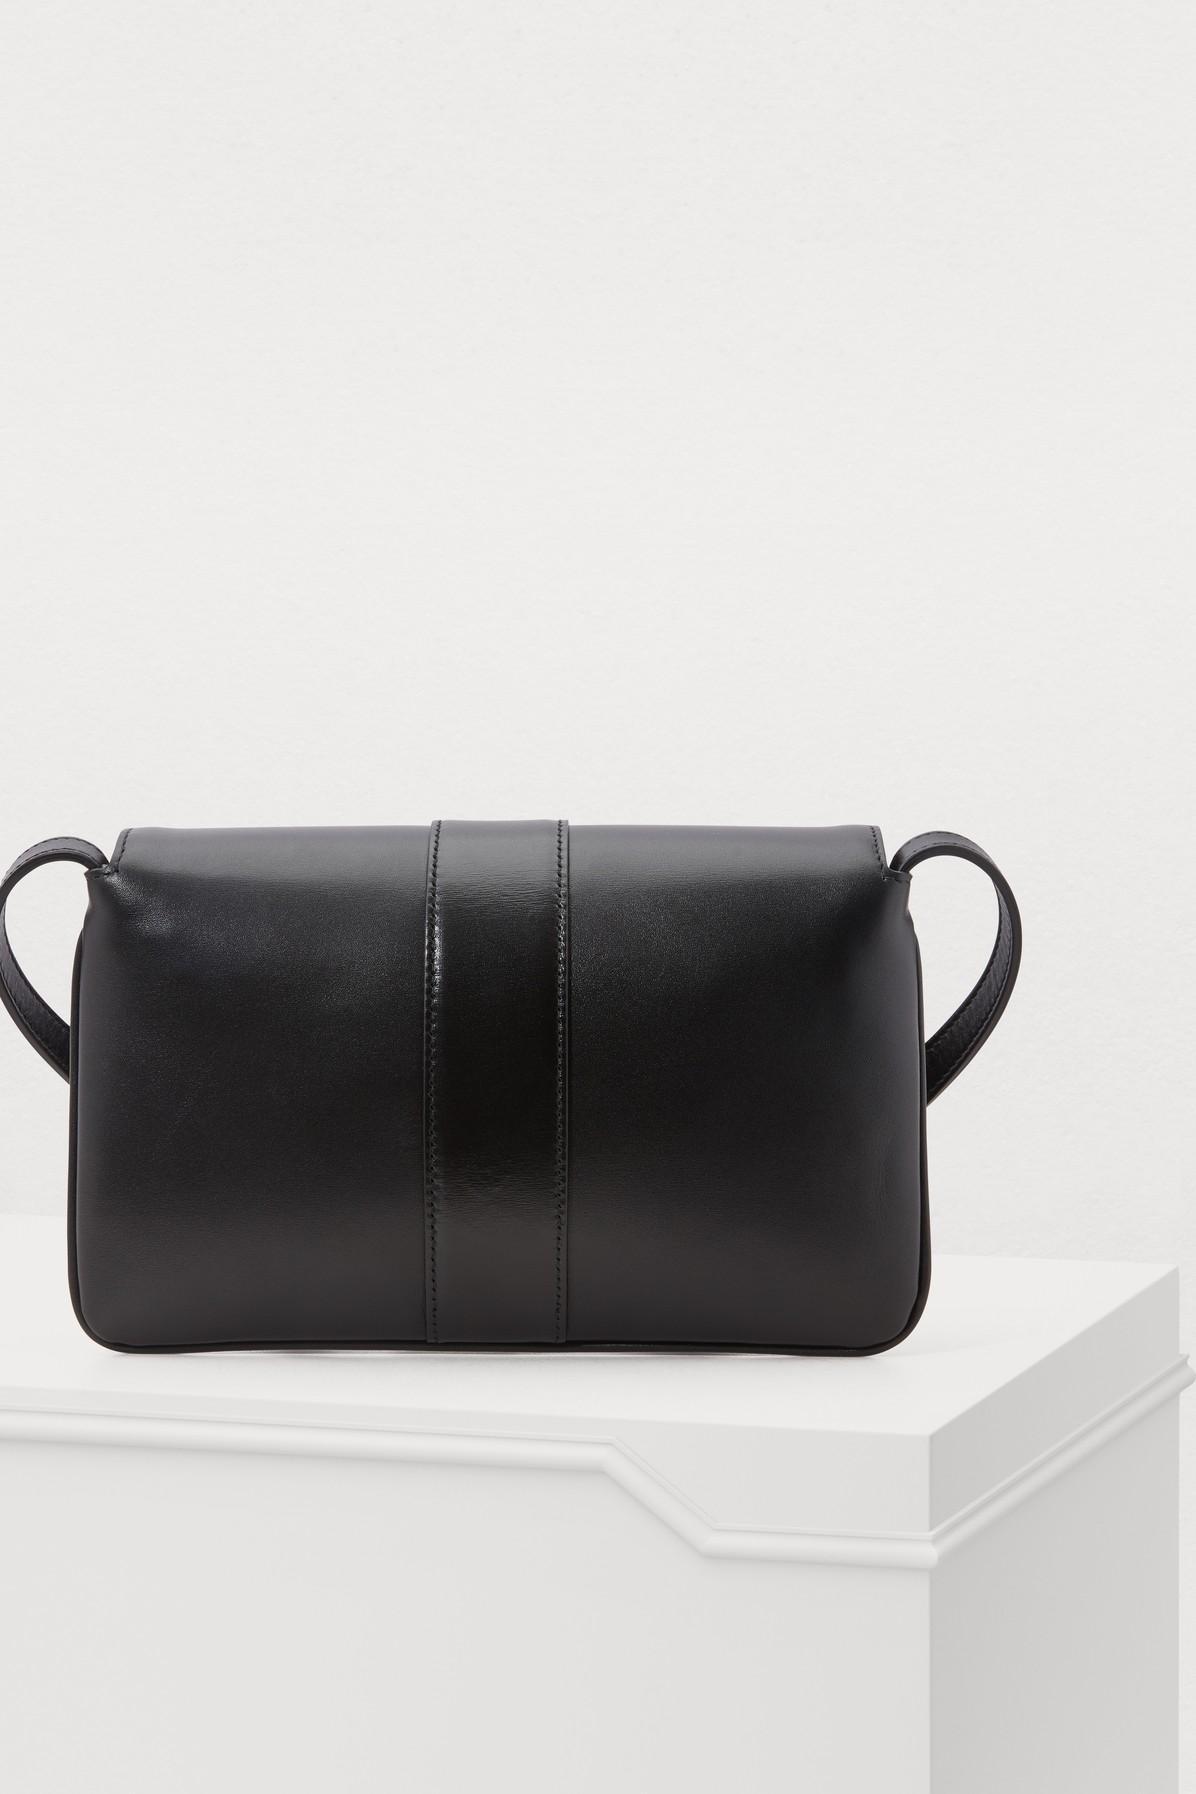 574131ce8b2b19 Gucci - Black Arli Small Crossbody Bag - Lyst. View fullscreen